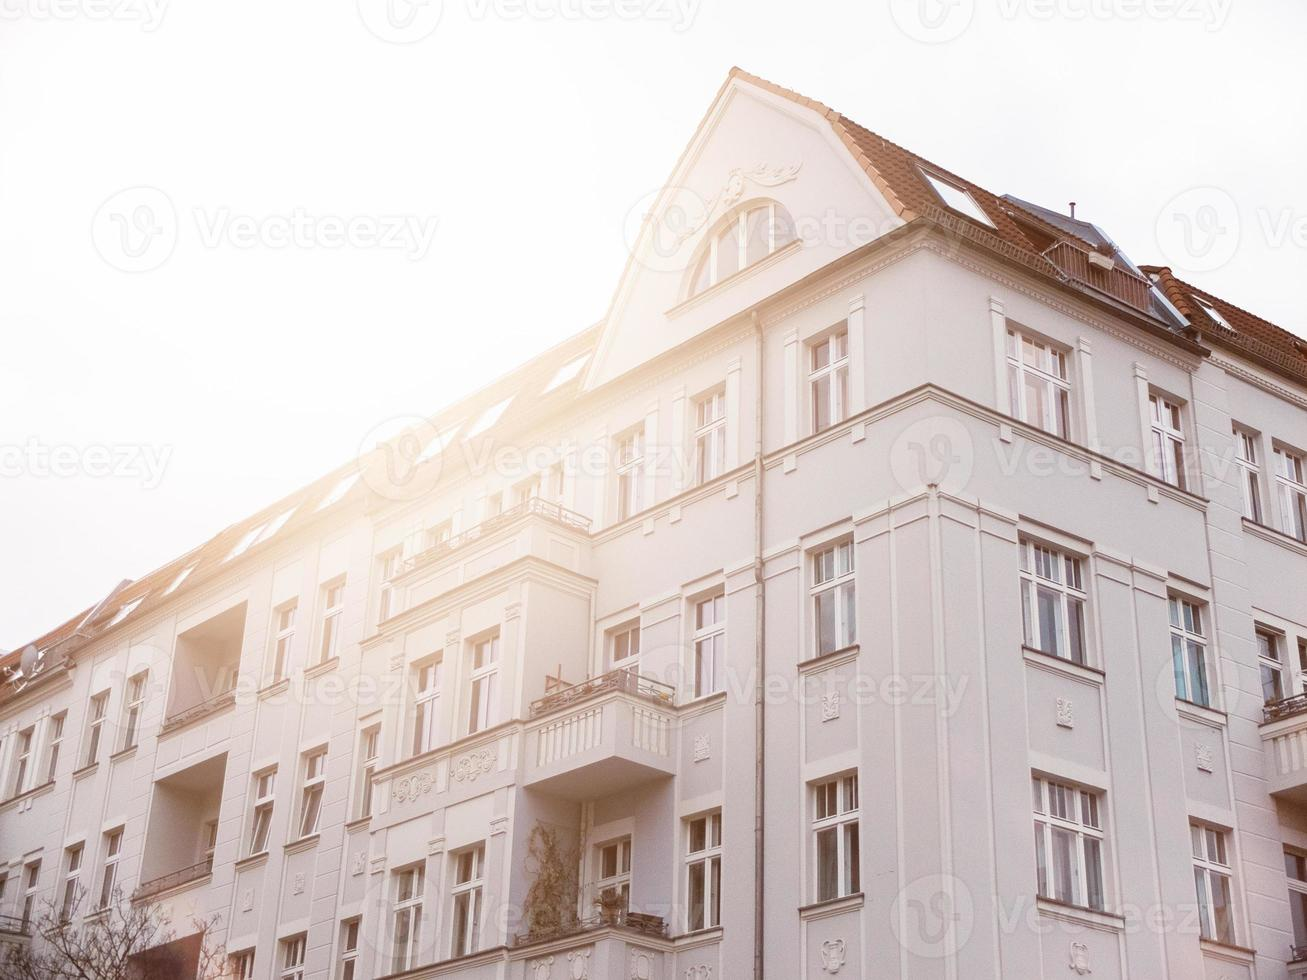 bella casa a Berlino prenzlauer berg foto